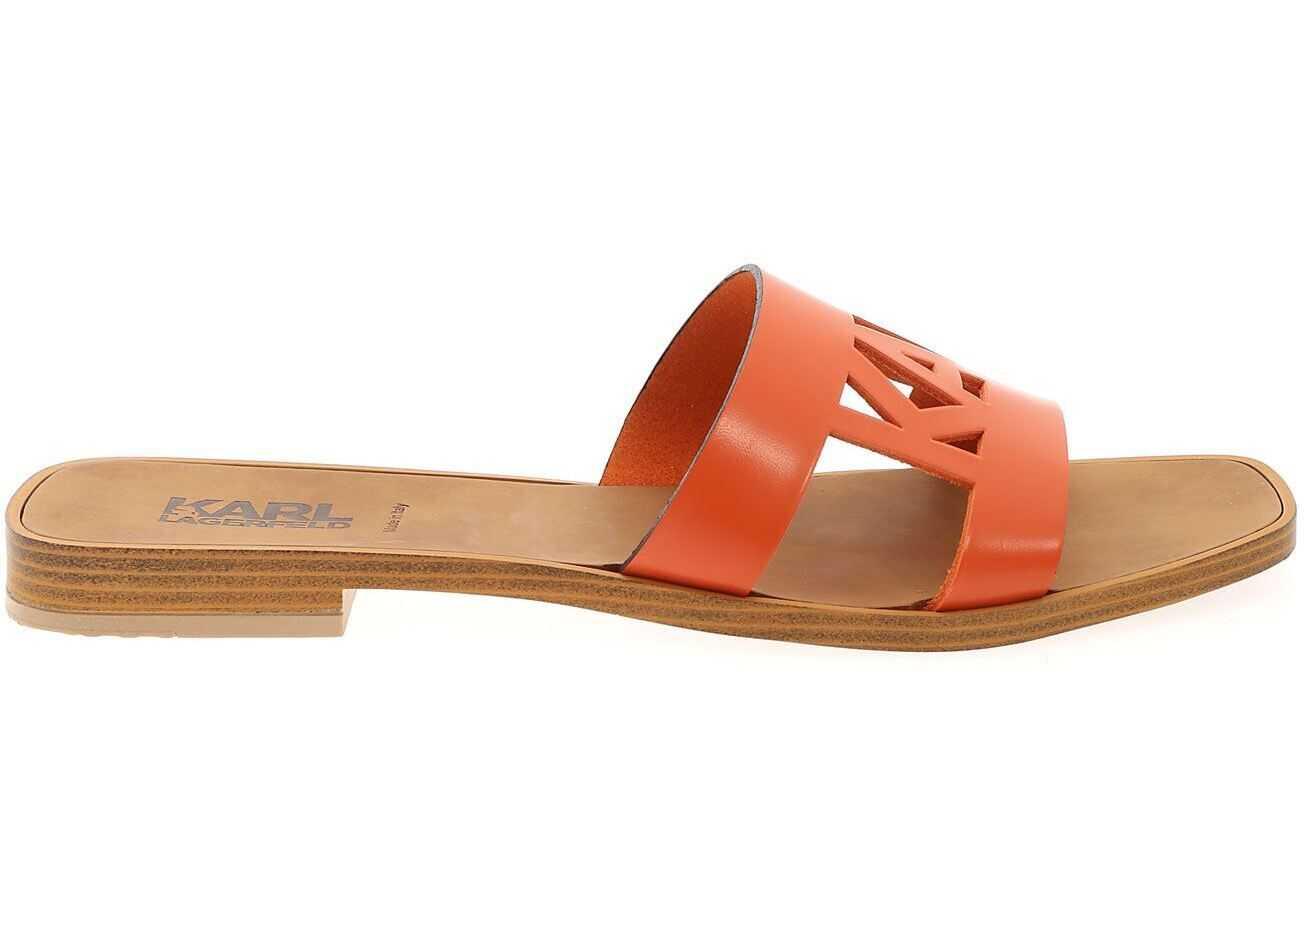 Karl Lagerfeld Cut-Out Mules In Orange KL8040502C Orange imagine b-mall.ro